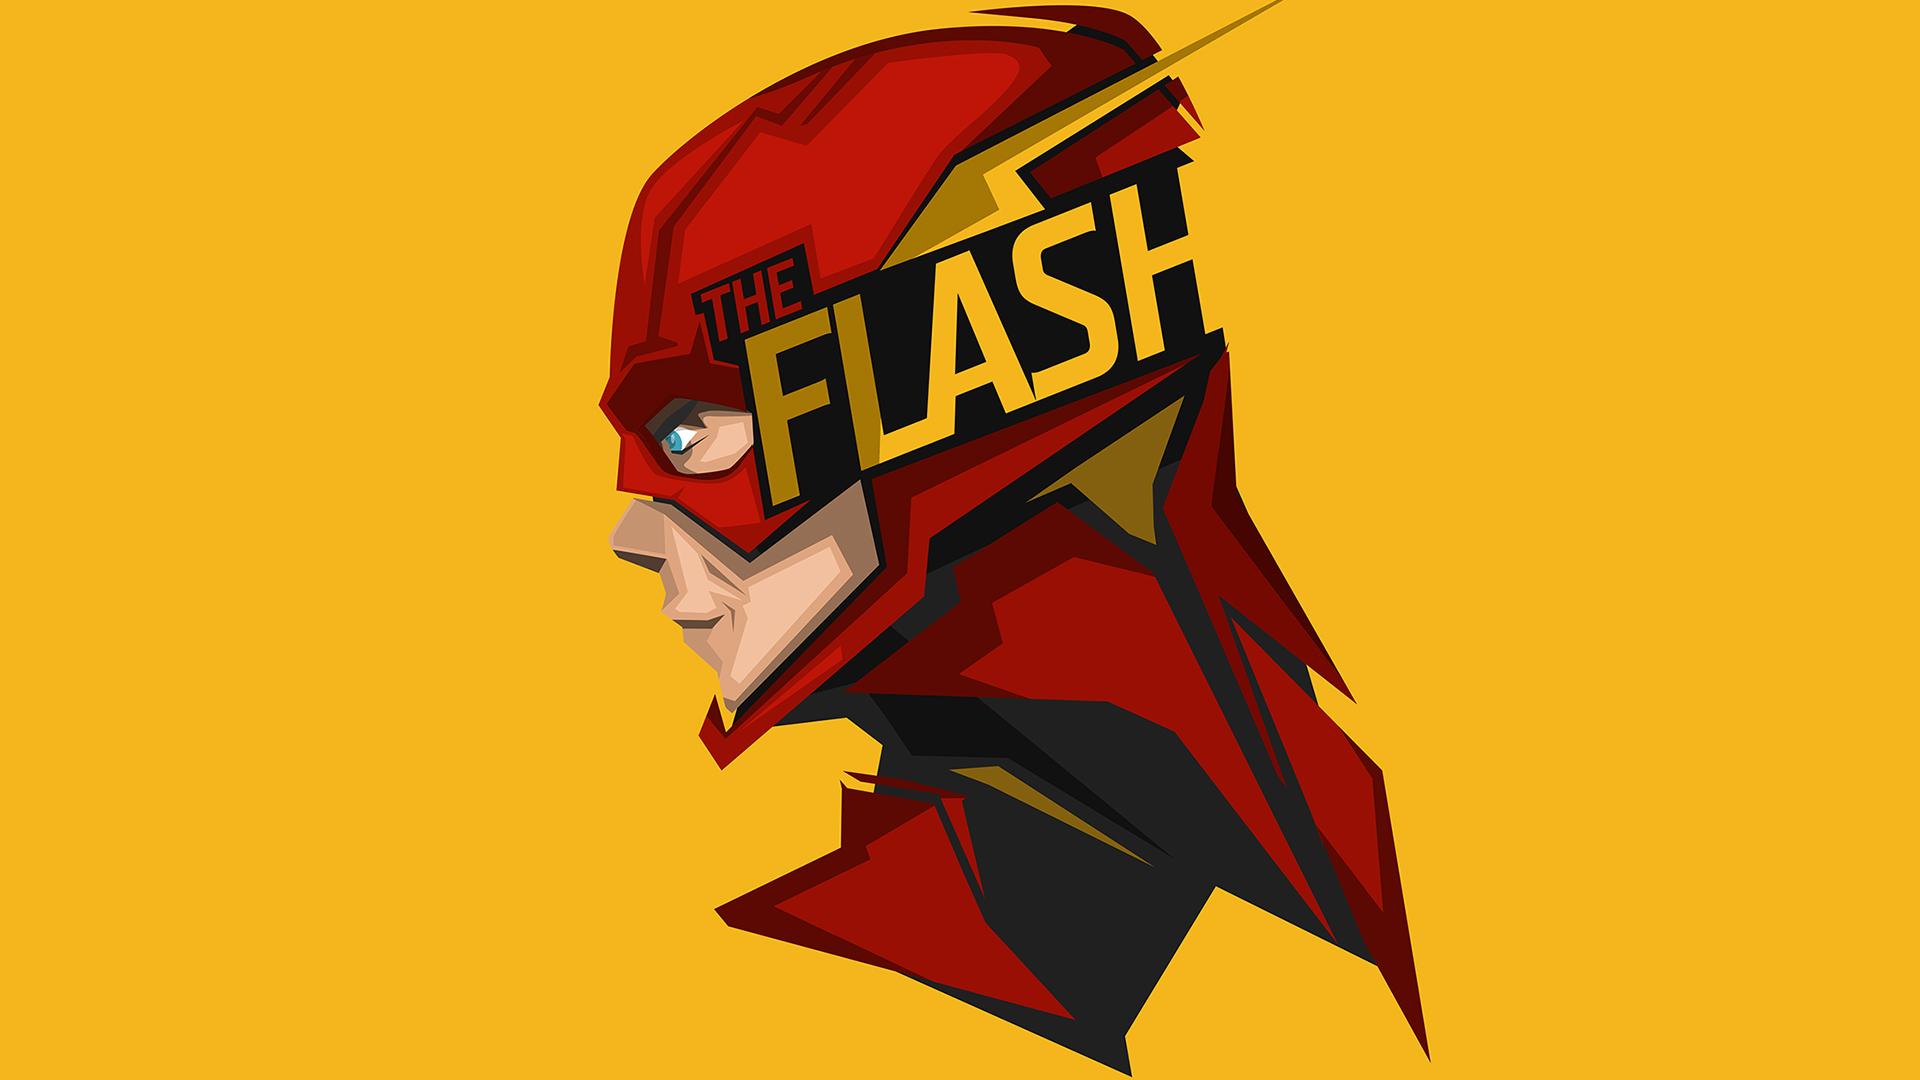 Reverse Flash Hd Wallpaper 1920x1080